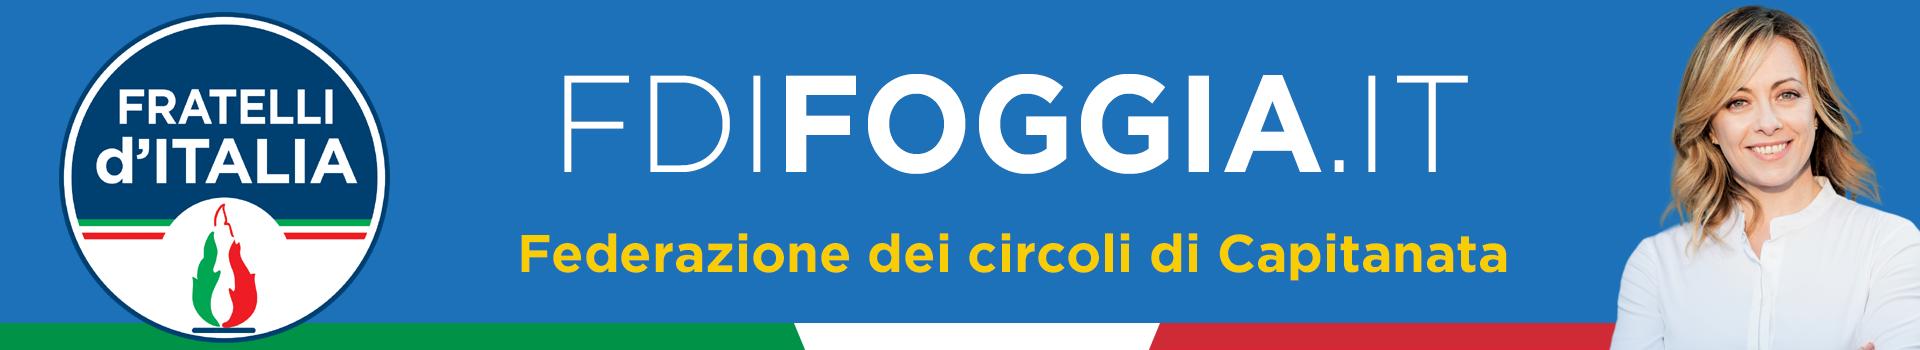 header2019_foggia